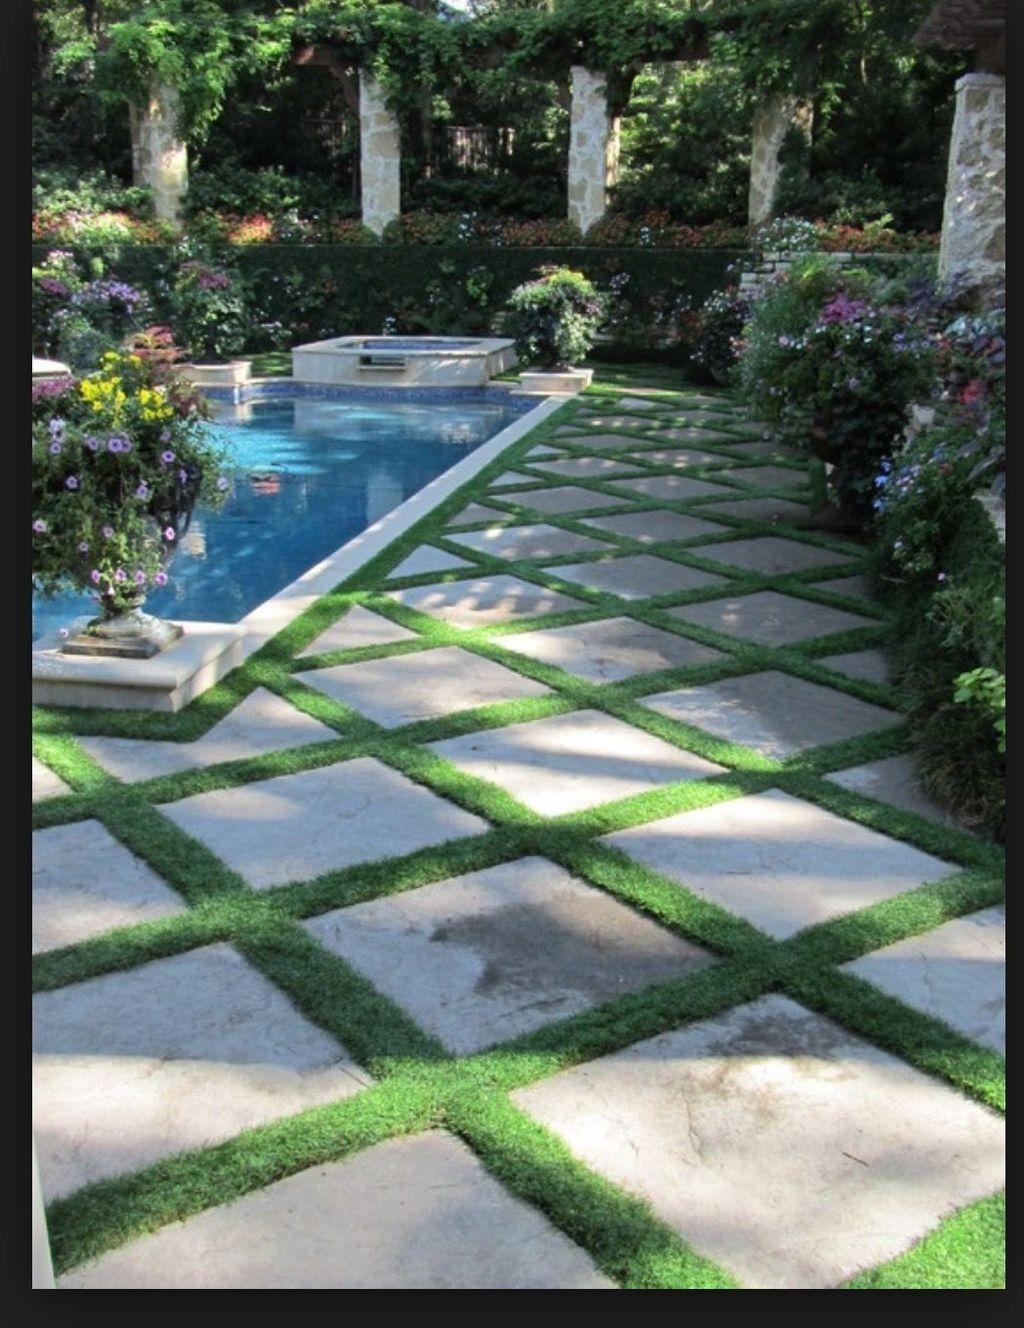 Pretty Grassless Backyard Landscaping Ideas31 Backyard Pool Landscaping Swimming Pools Backyard Pools For Small Yards Backyard landscaping ideas without pool